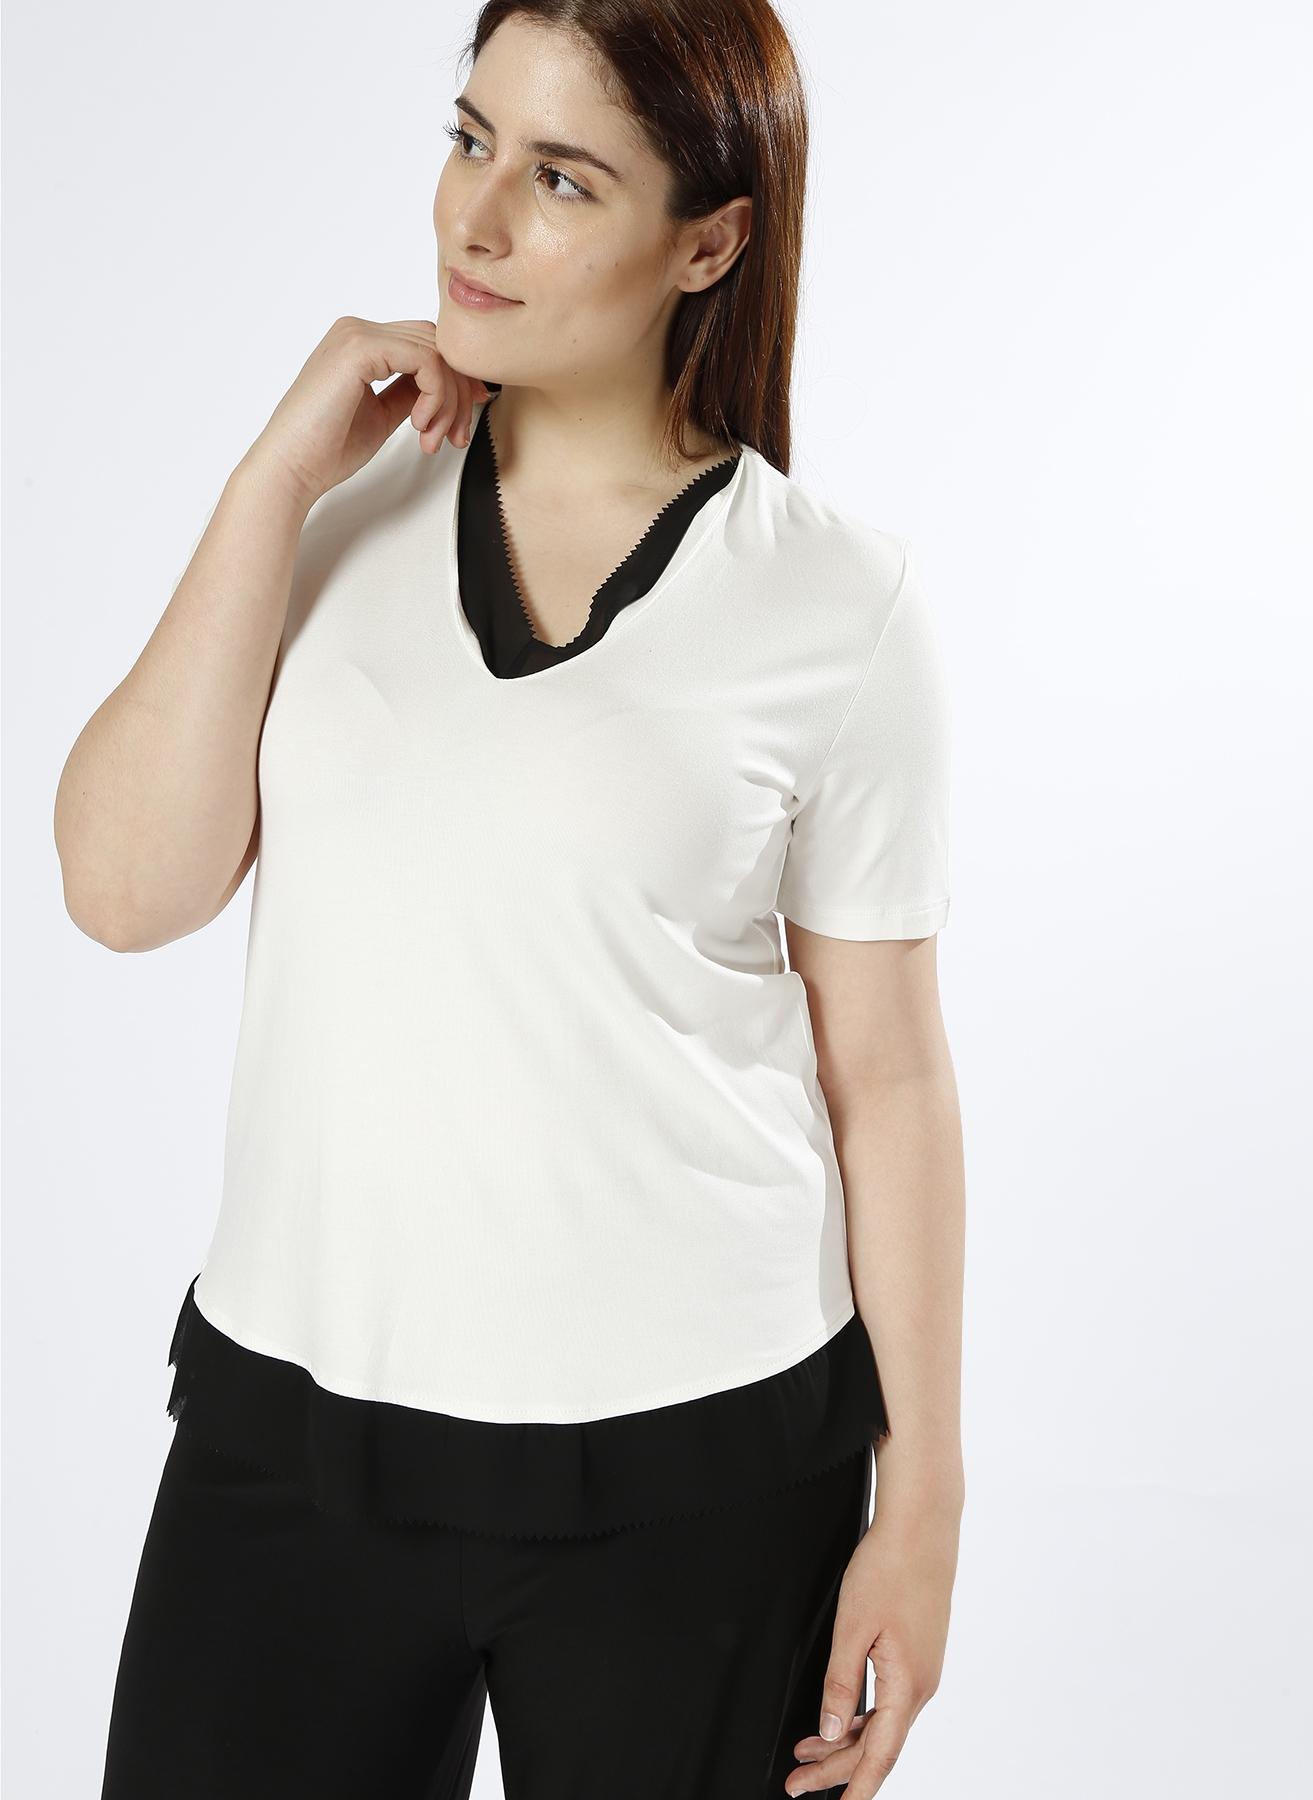 Ekol Tül Detaylı Siyah - Beyaz T-Shirt 3 5000223346001 Ürün Resmi